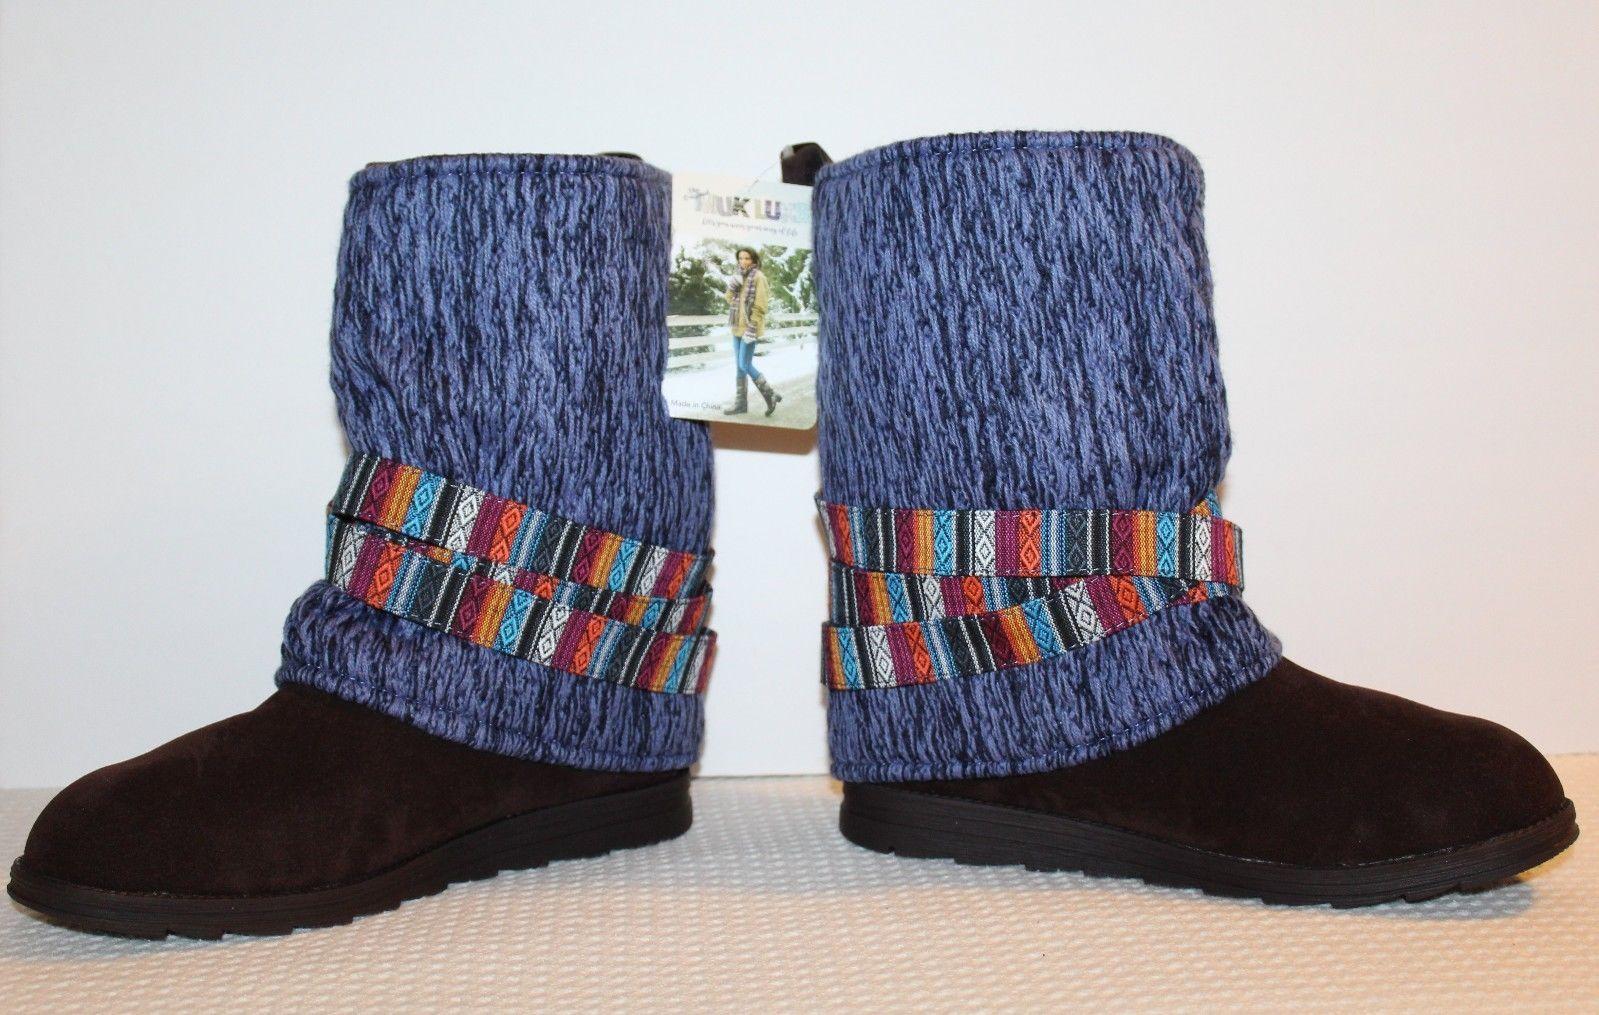 aecc191c6d NEW MUK LUKS Nikki Denim Women's Size 11 and 50 similar items